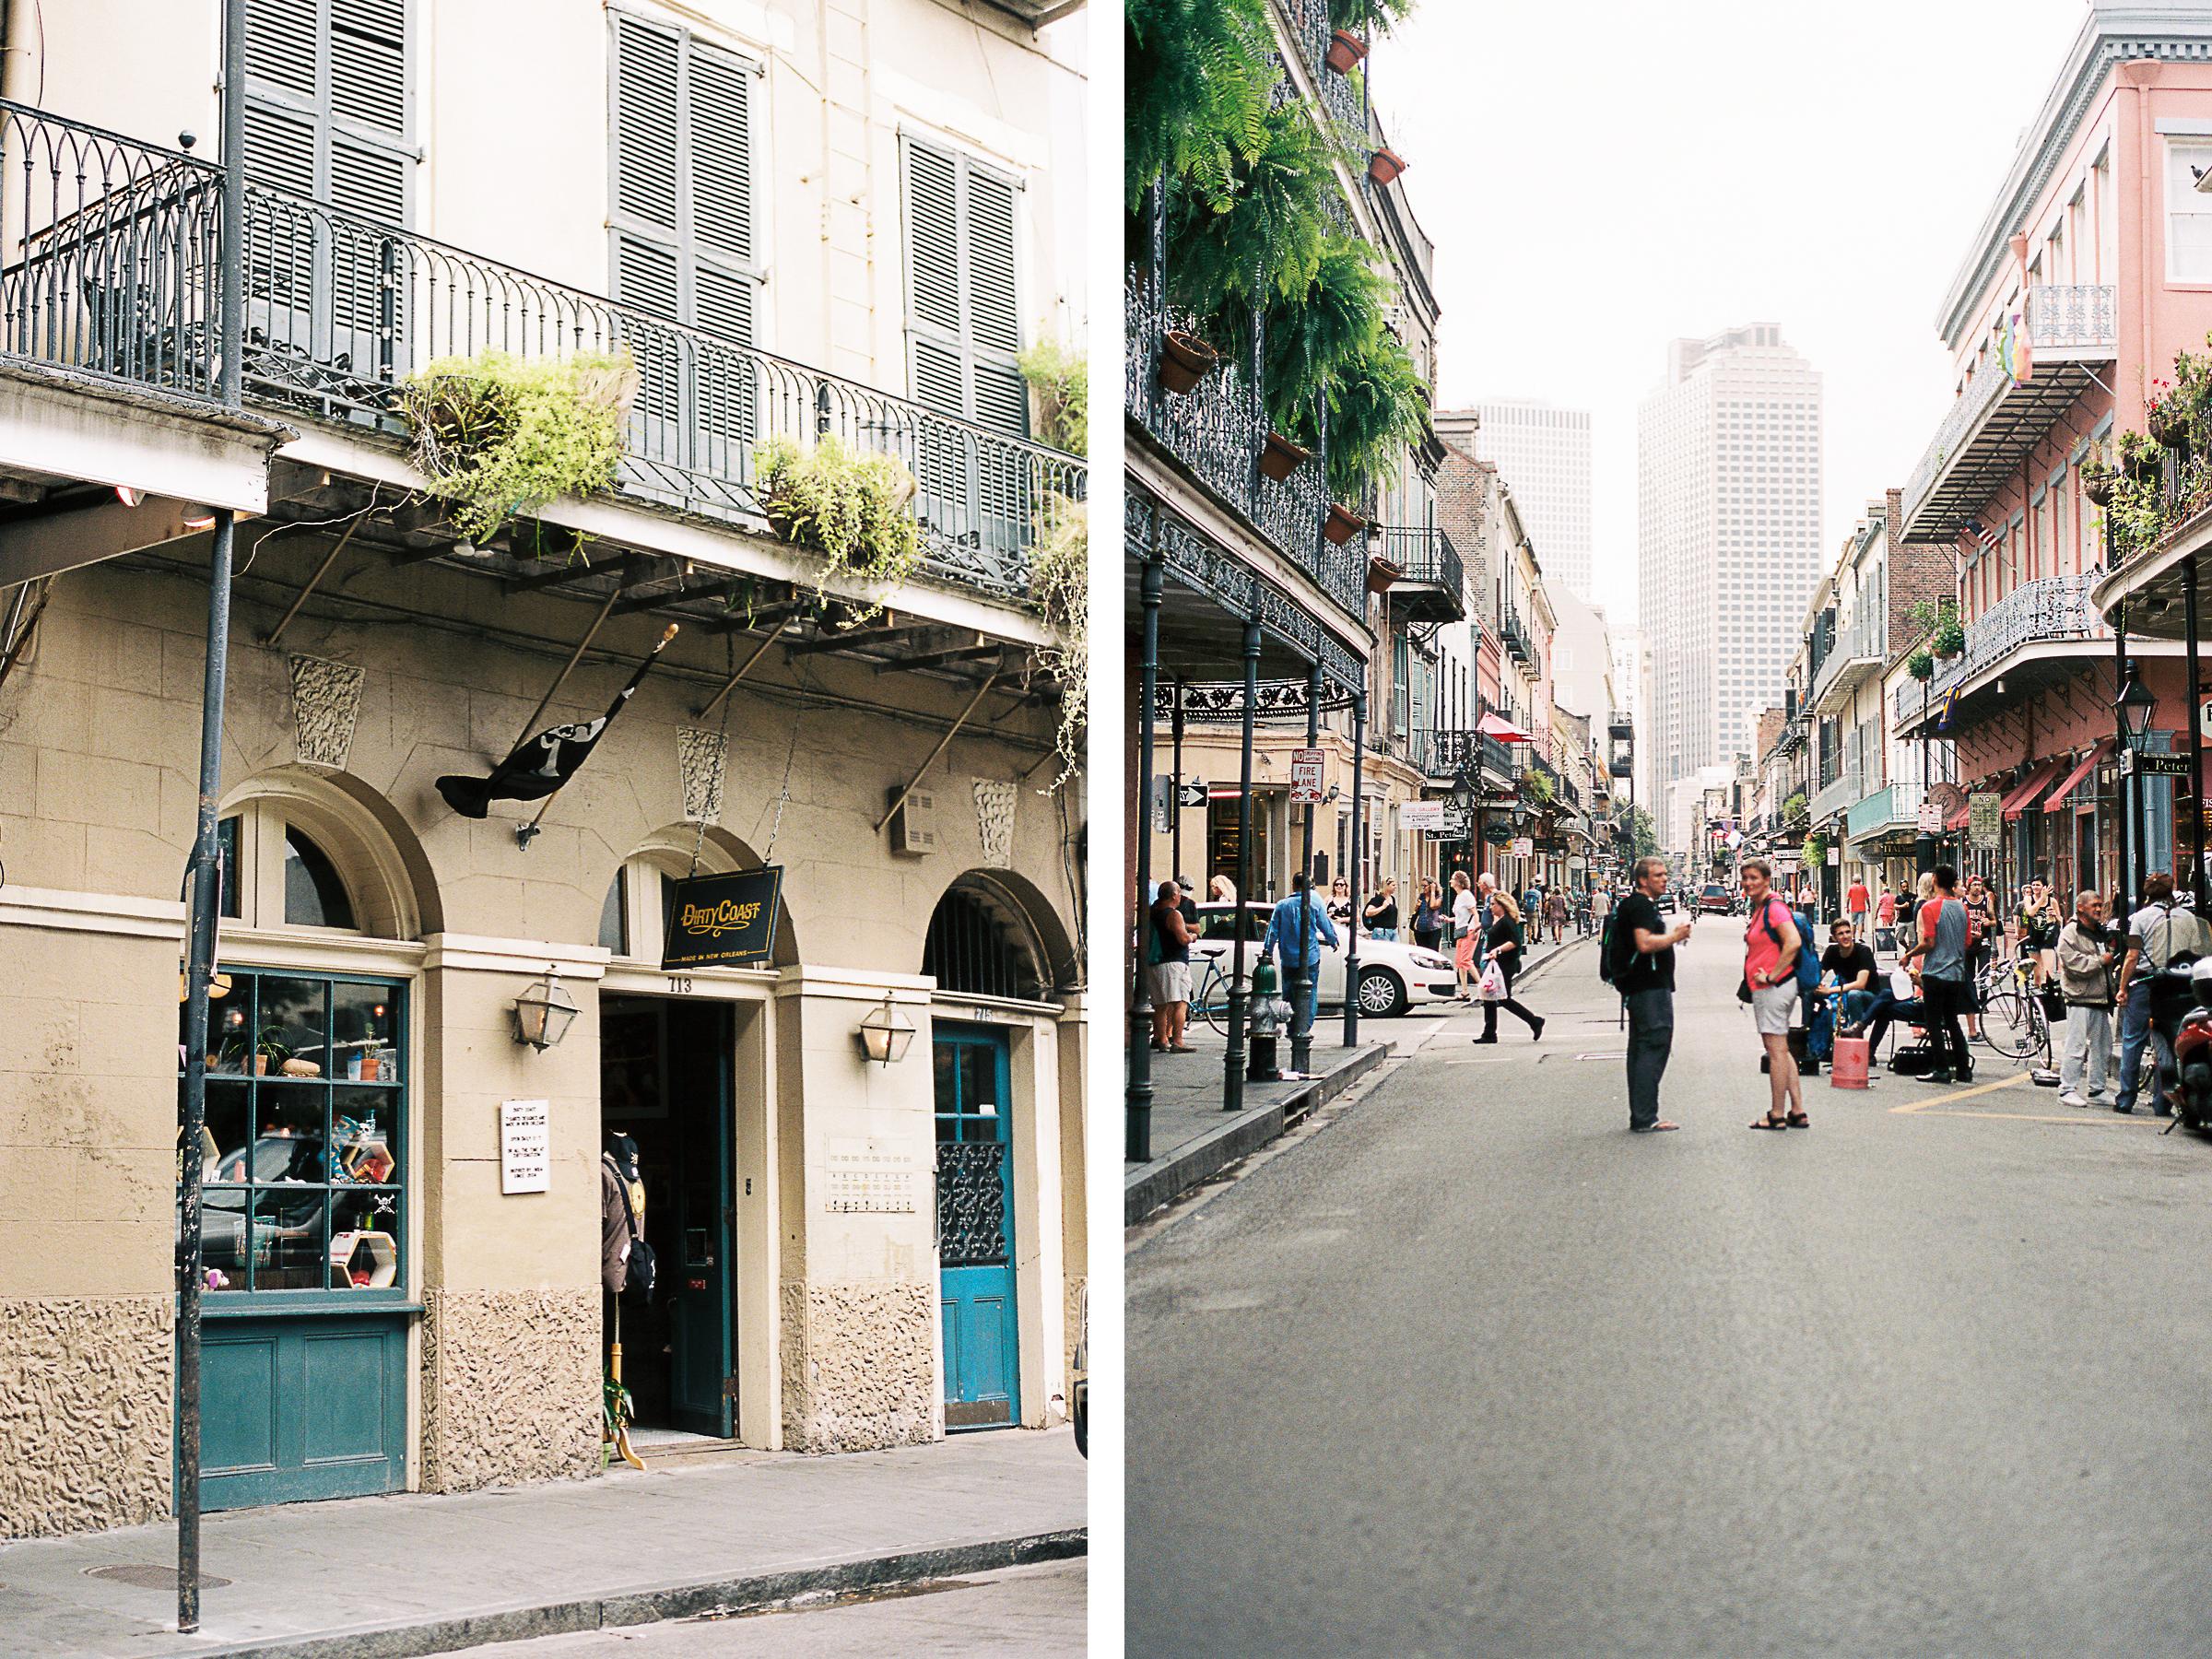 New-Orleans-Travel-Destination-Photography-1.jpg